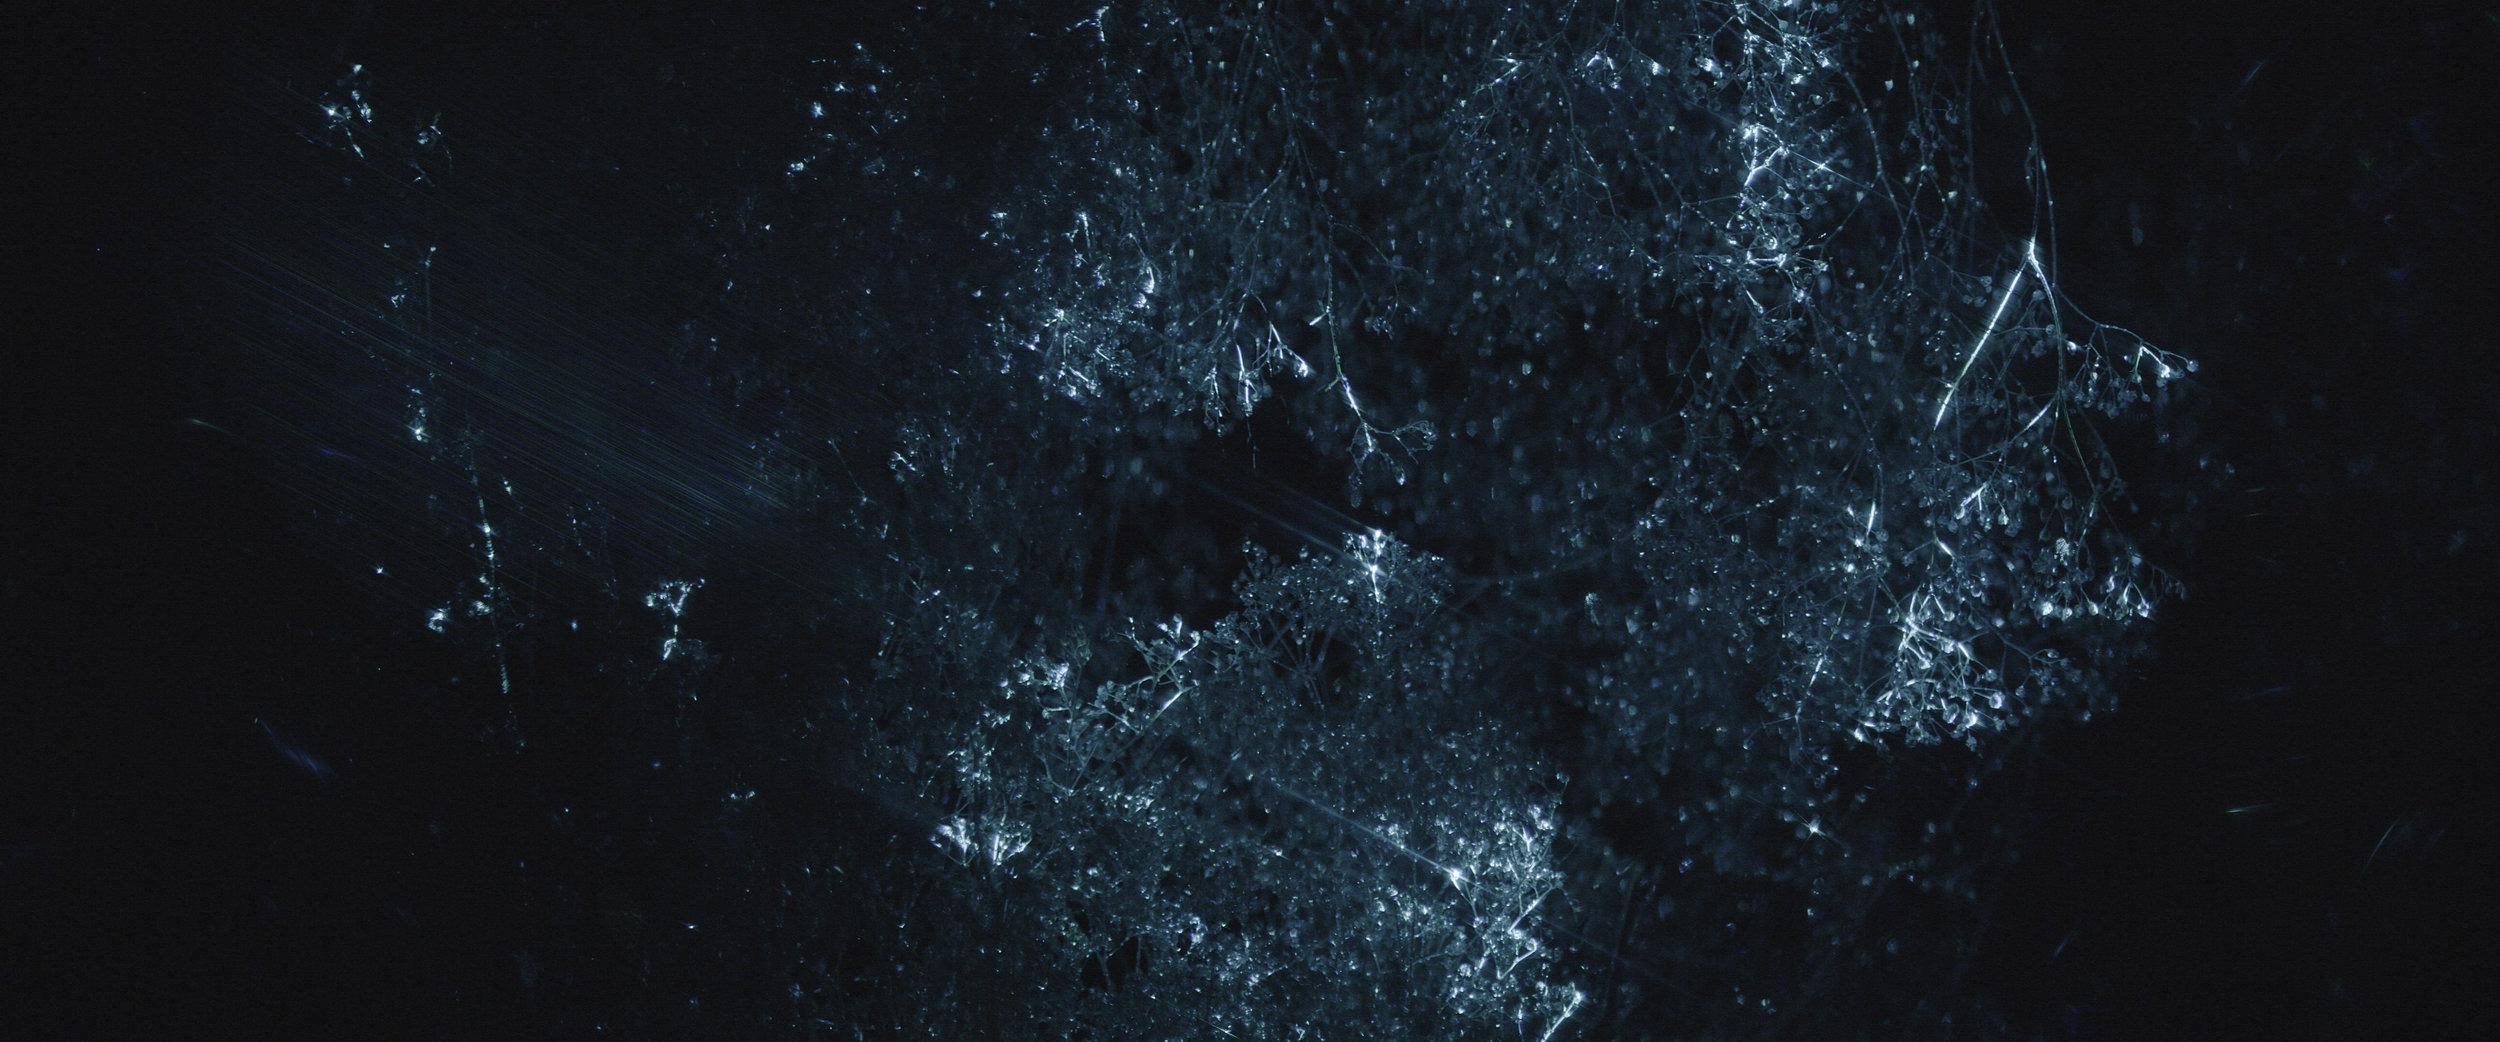 Infiniti Temporal - Peter Clark - Callmeclark.com